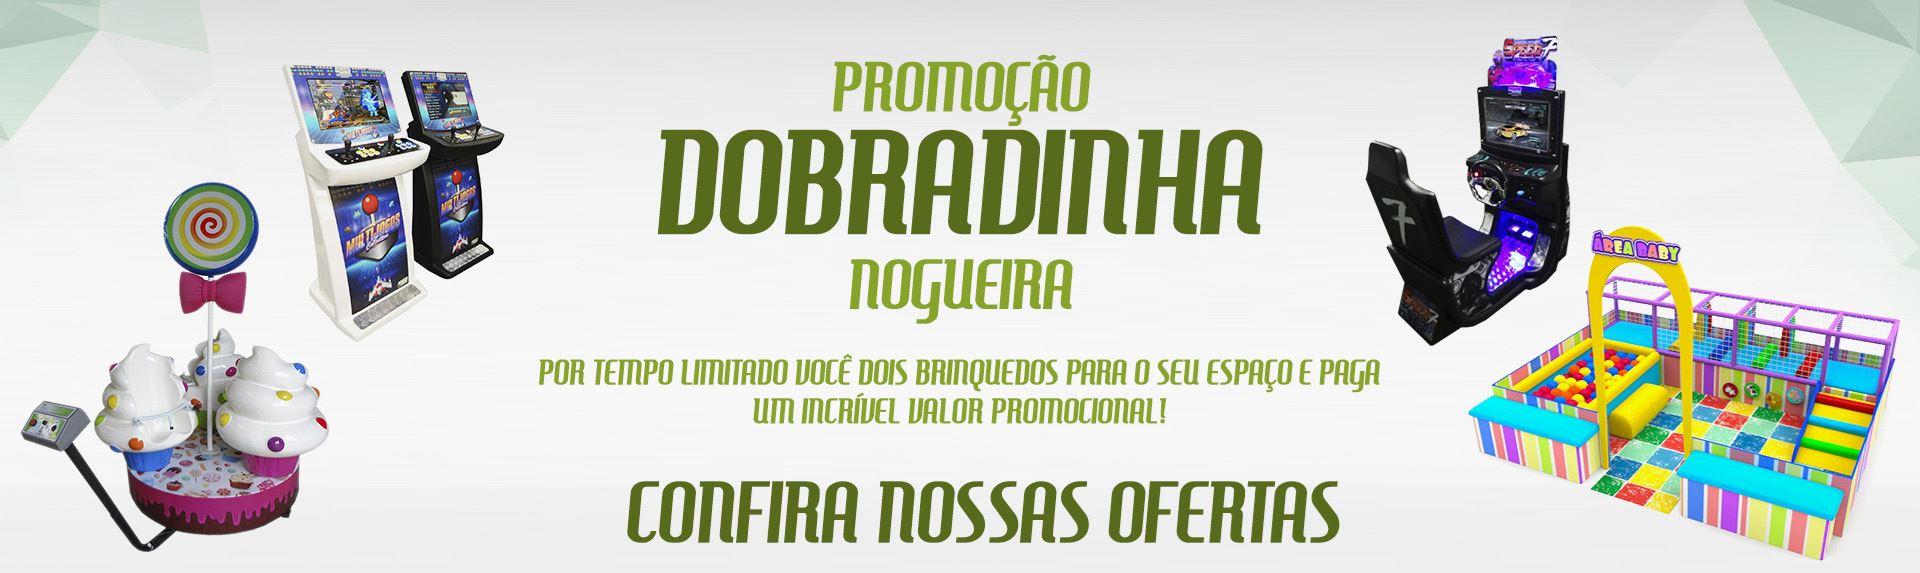 20130923 Sign24 moreover 194a5e ba19b24 furthermore Blog Post further Everyday Selfie 4 besides Promocao Dobradinha Nogueira. on 24